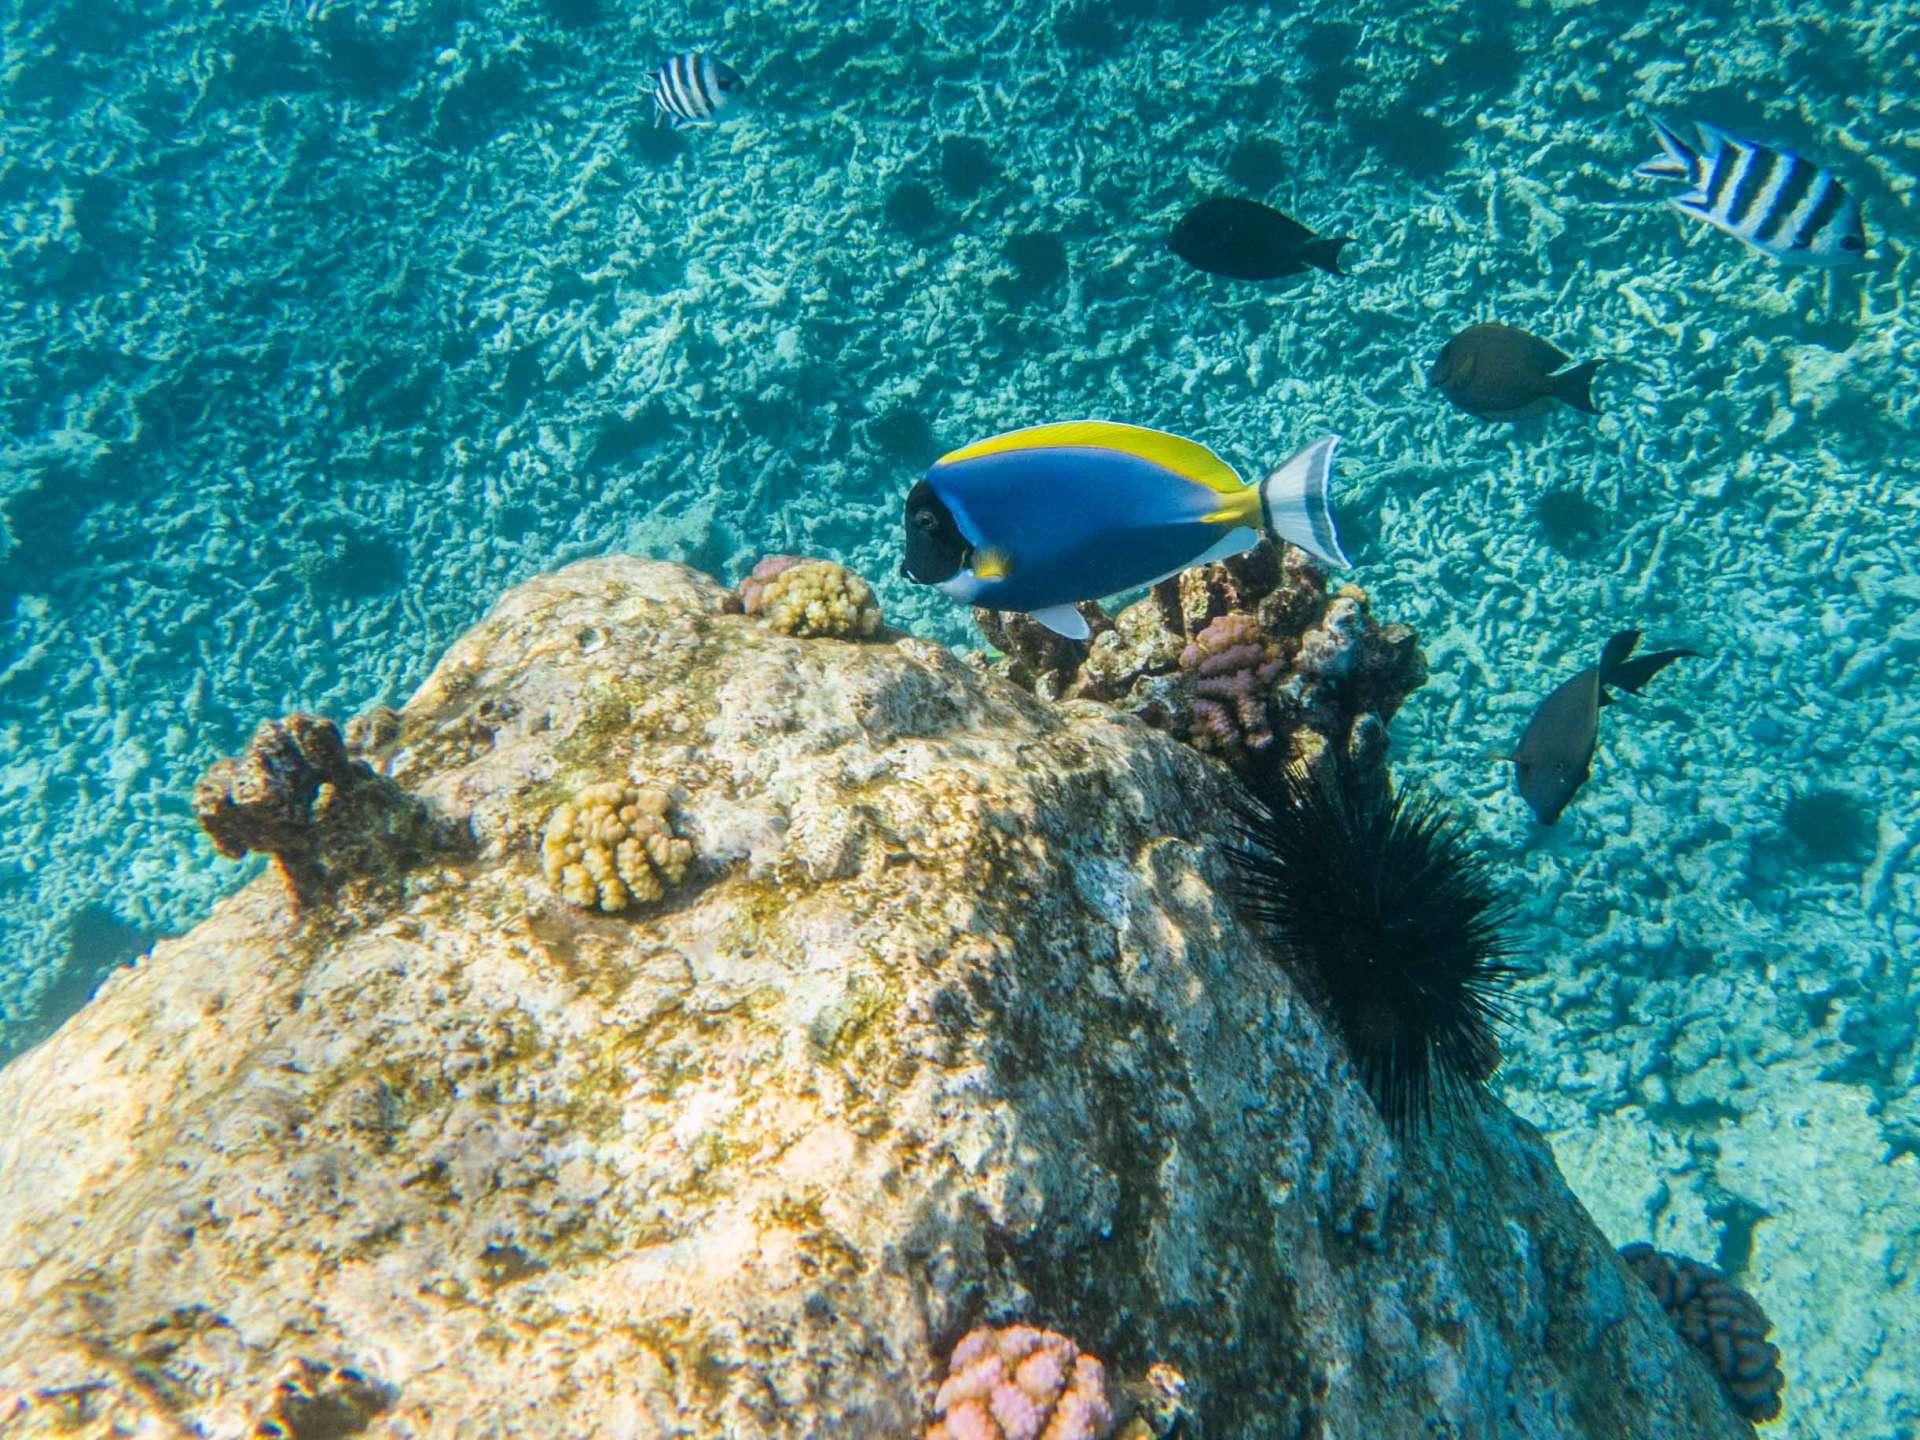 Coco island Seychelles travel photography underwater snorkeling enrico pescantini.GPR